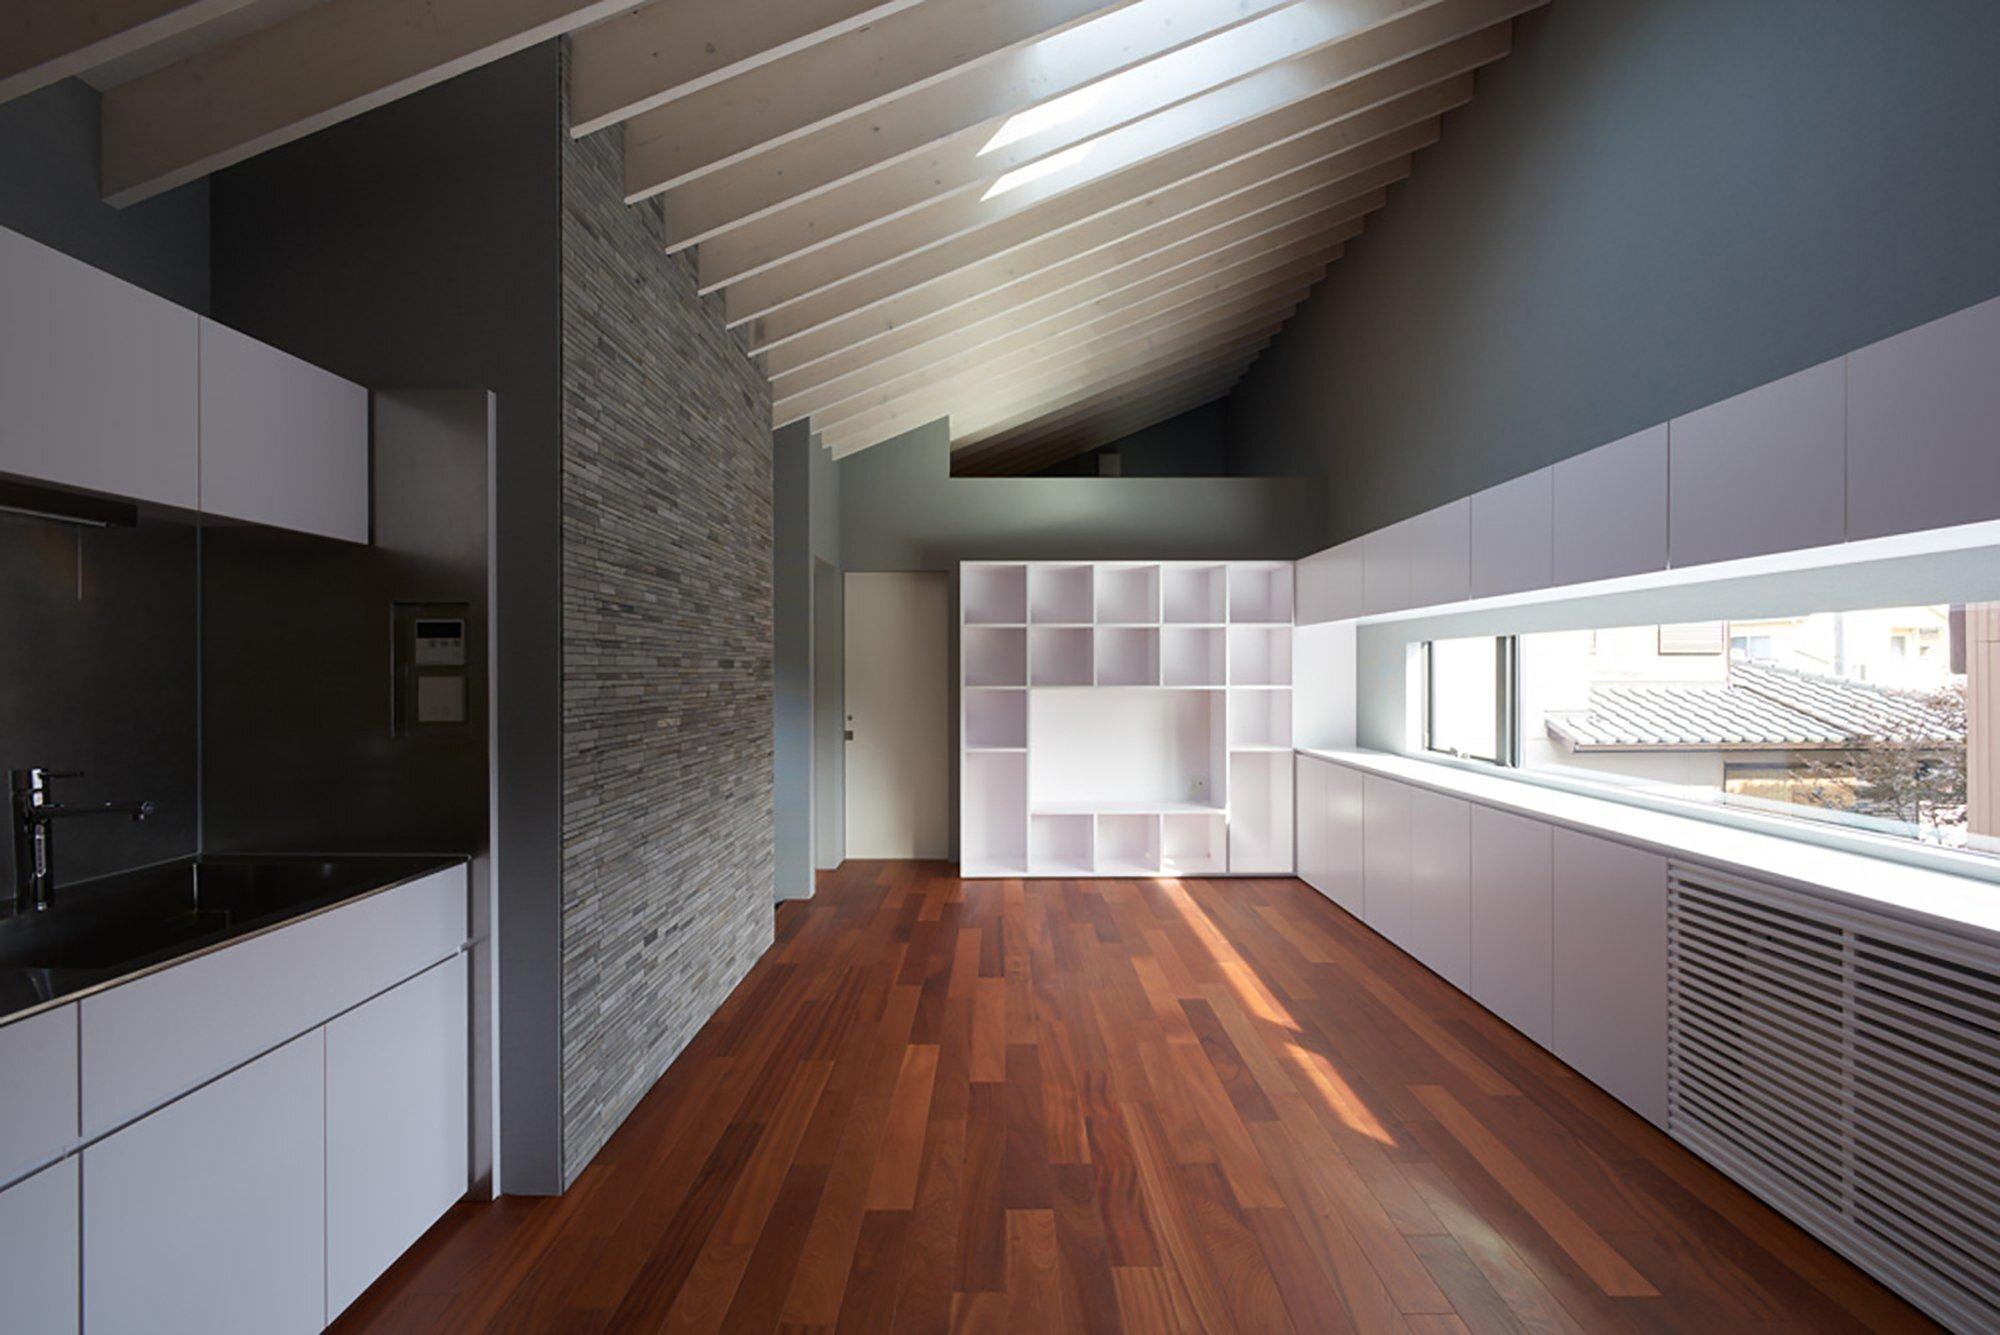 House Ageo - Small House - KASA Architects - Japan - Living Area - Humble Homes